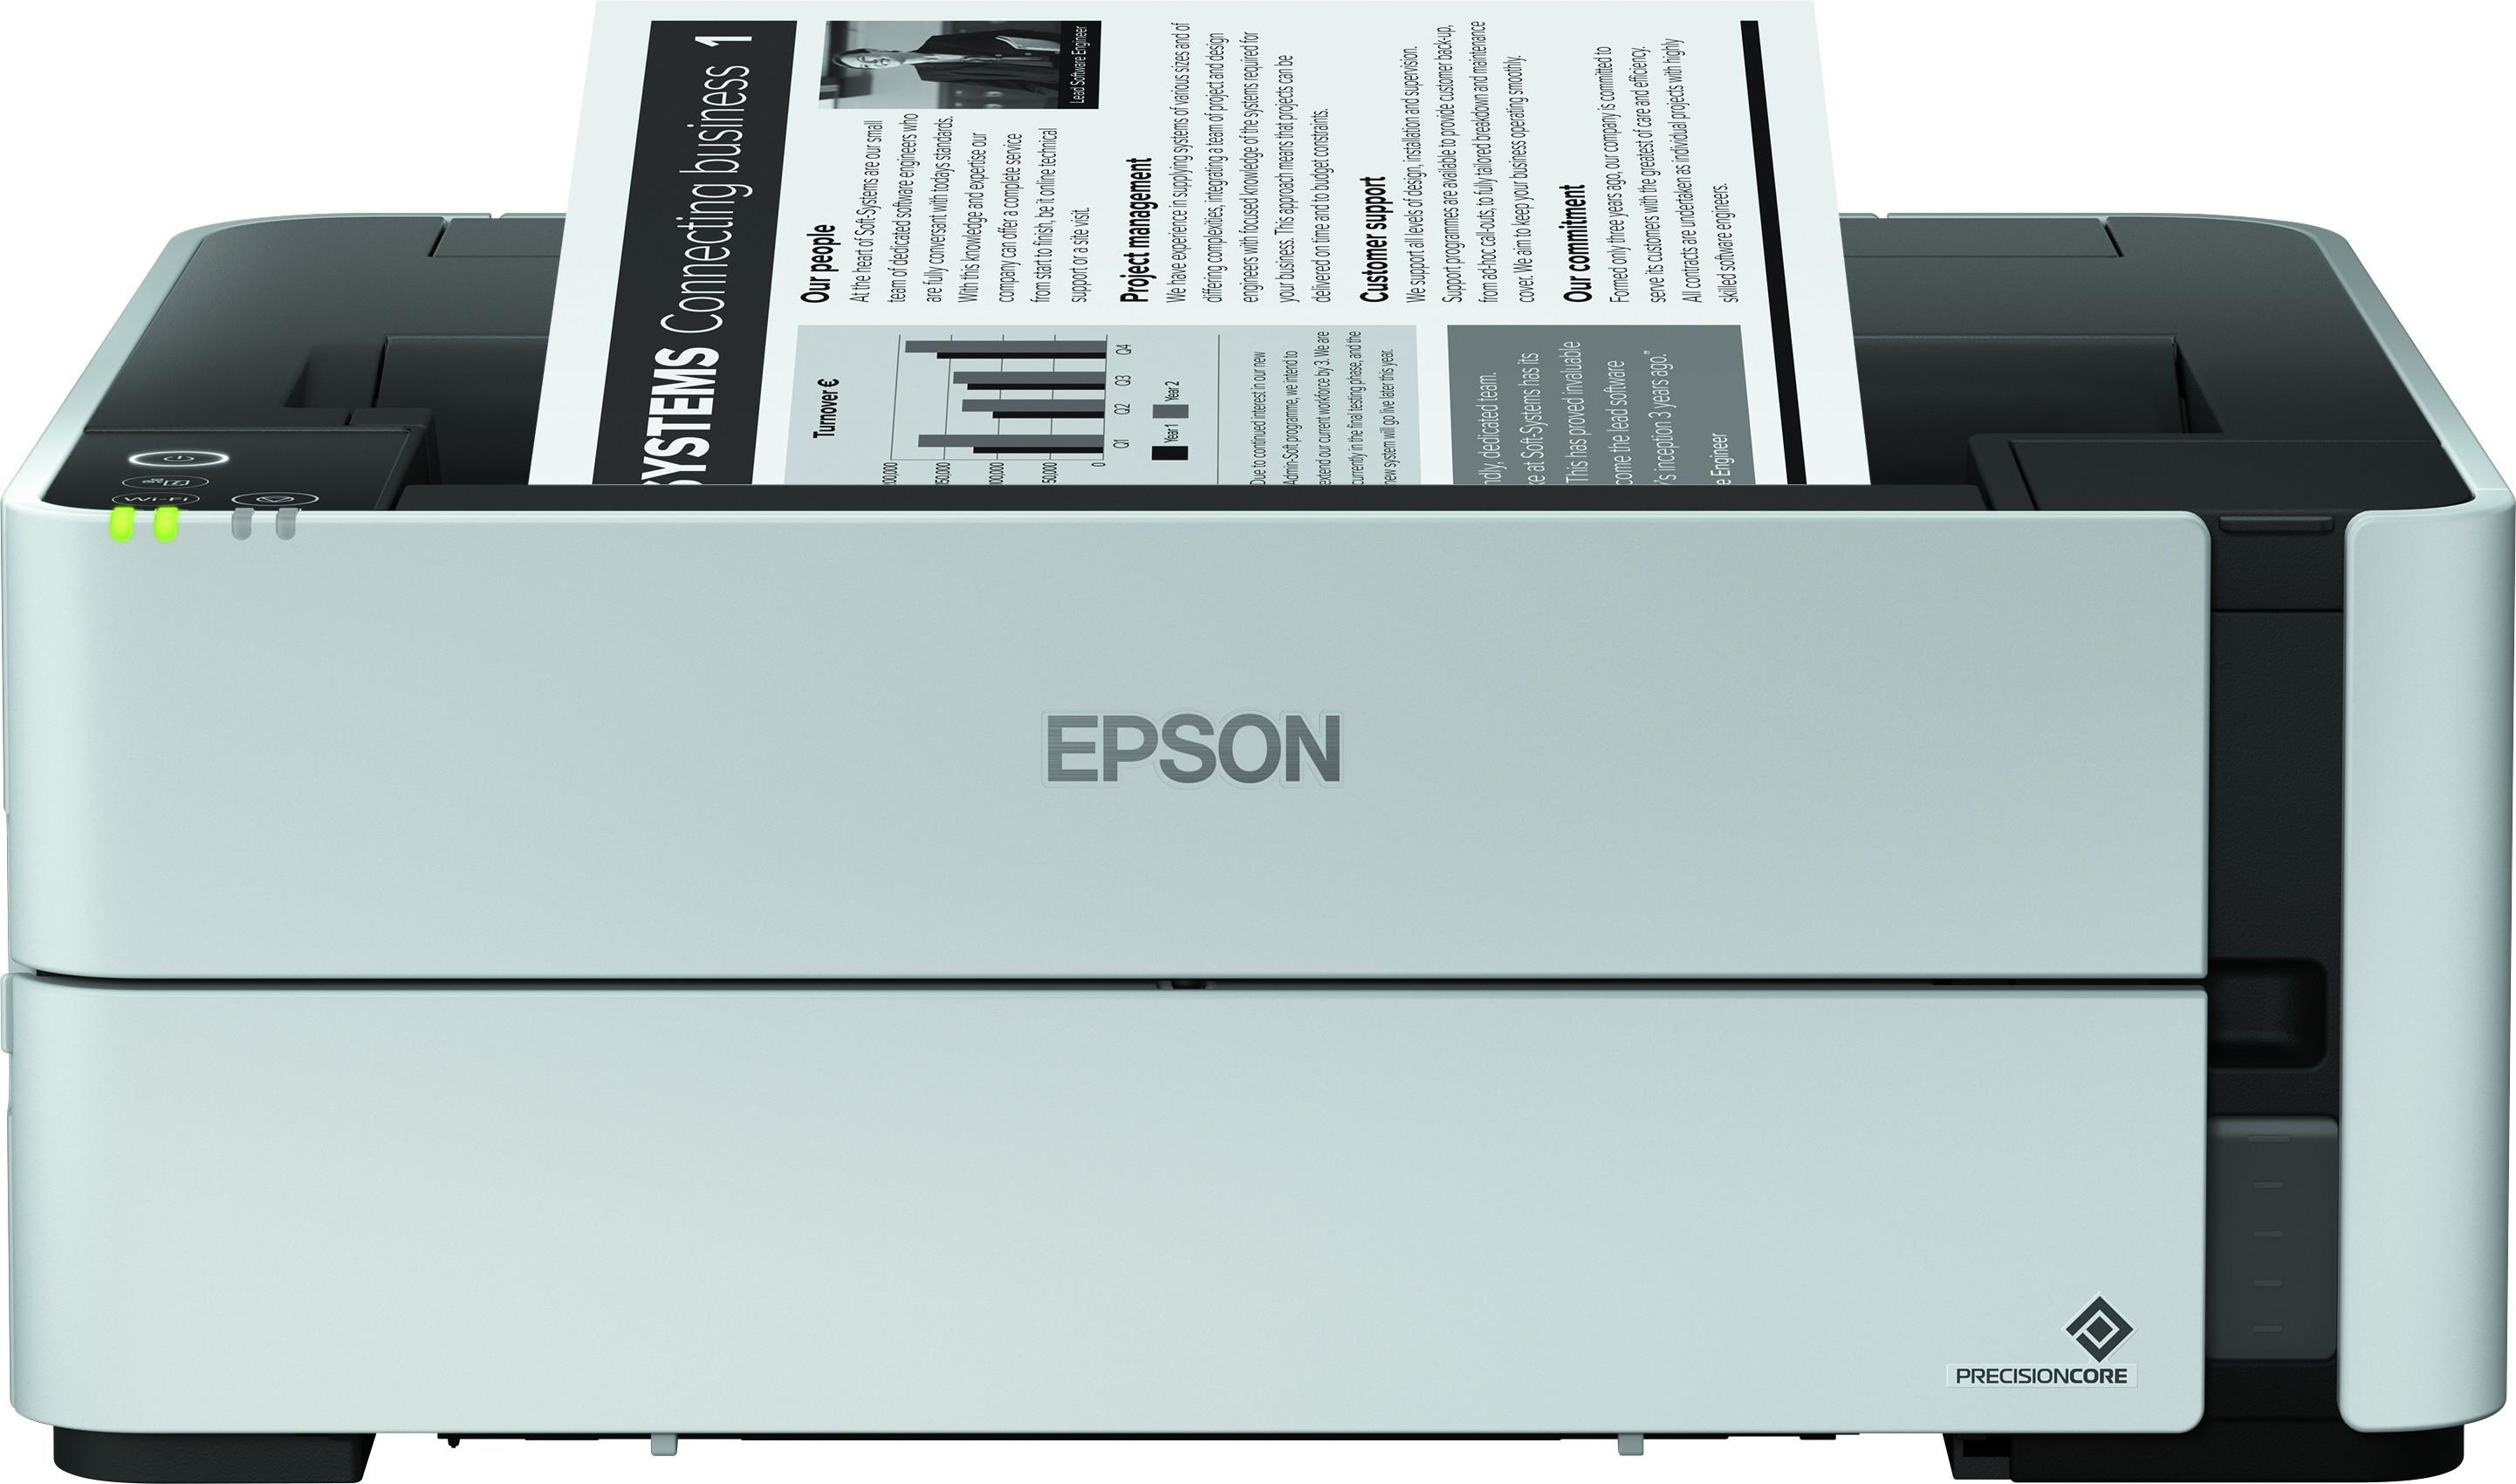 Epson EcoTank M1170 A4, mono, tintasugaras nyomtató hálózatos, Wi-Fi-s, duplex